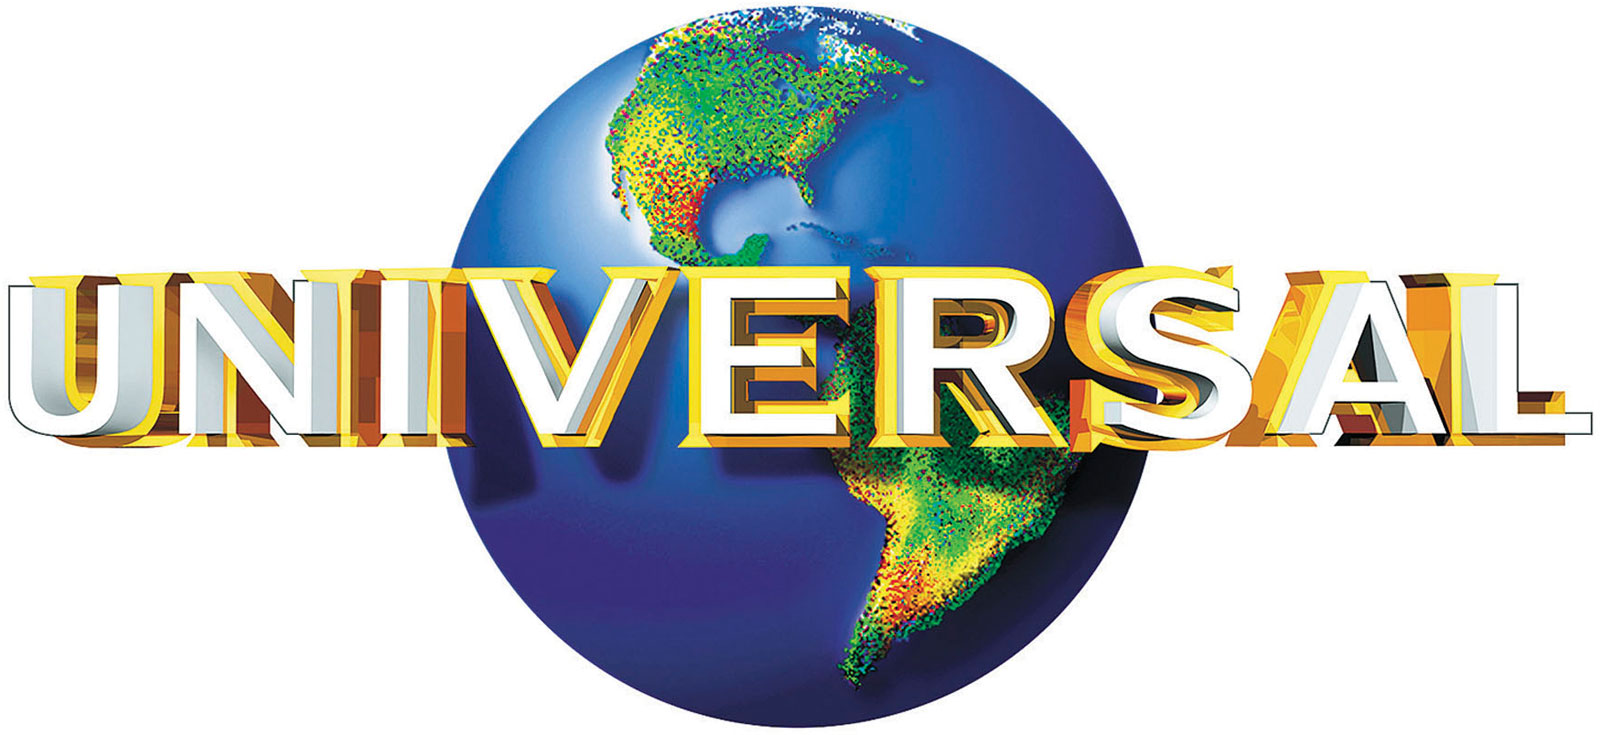 Universal Studios Hollywood's logo